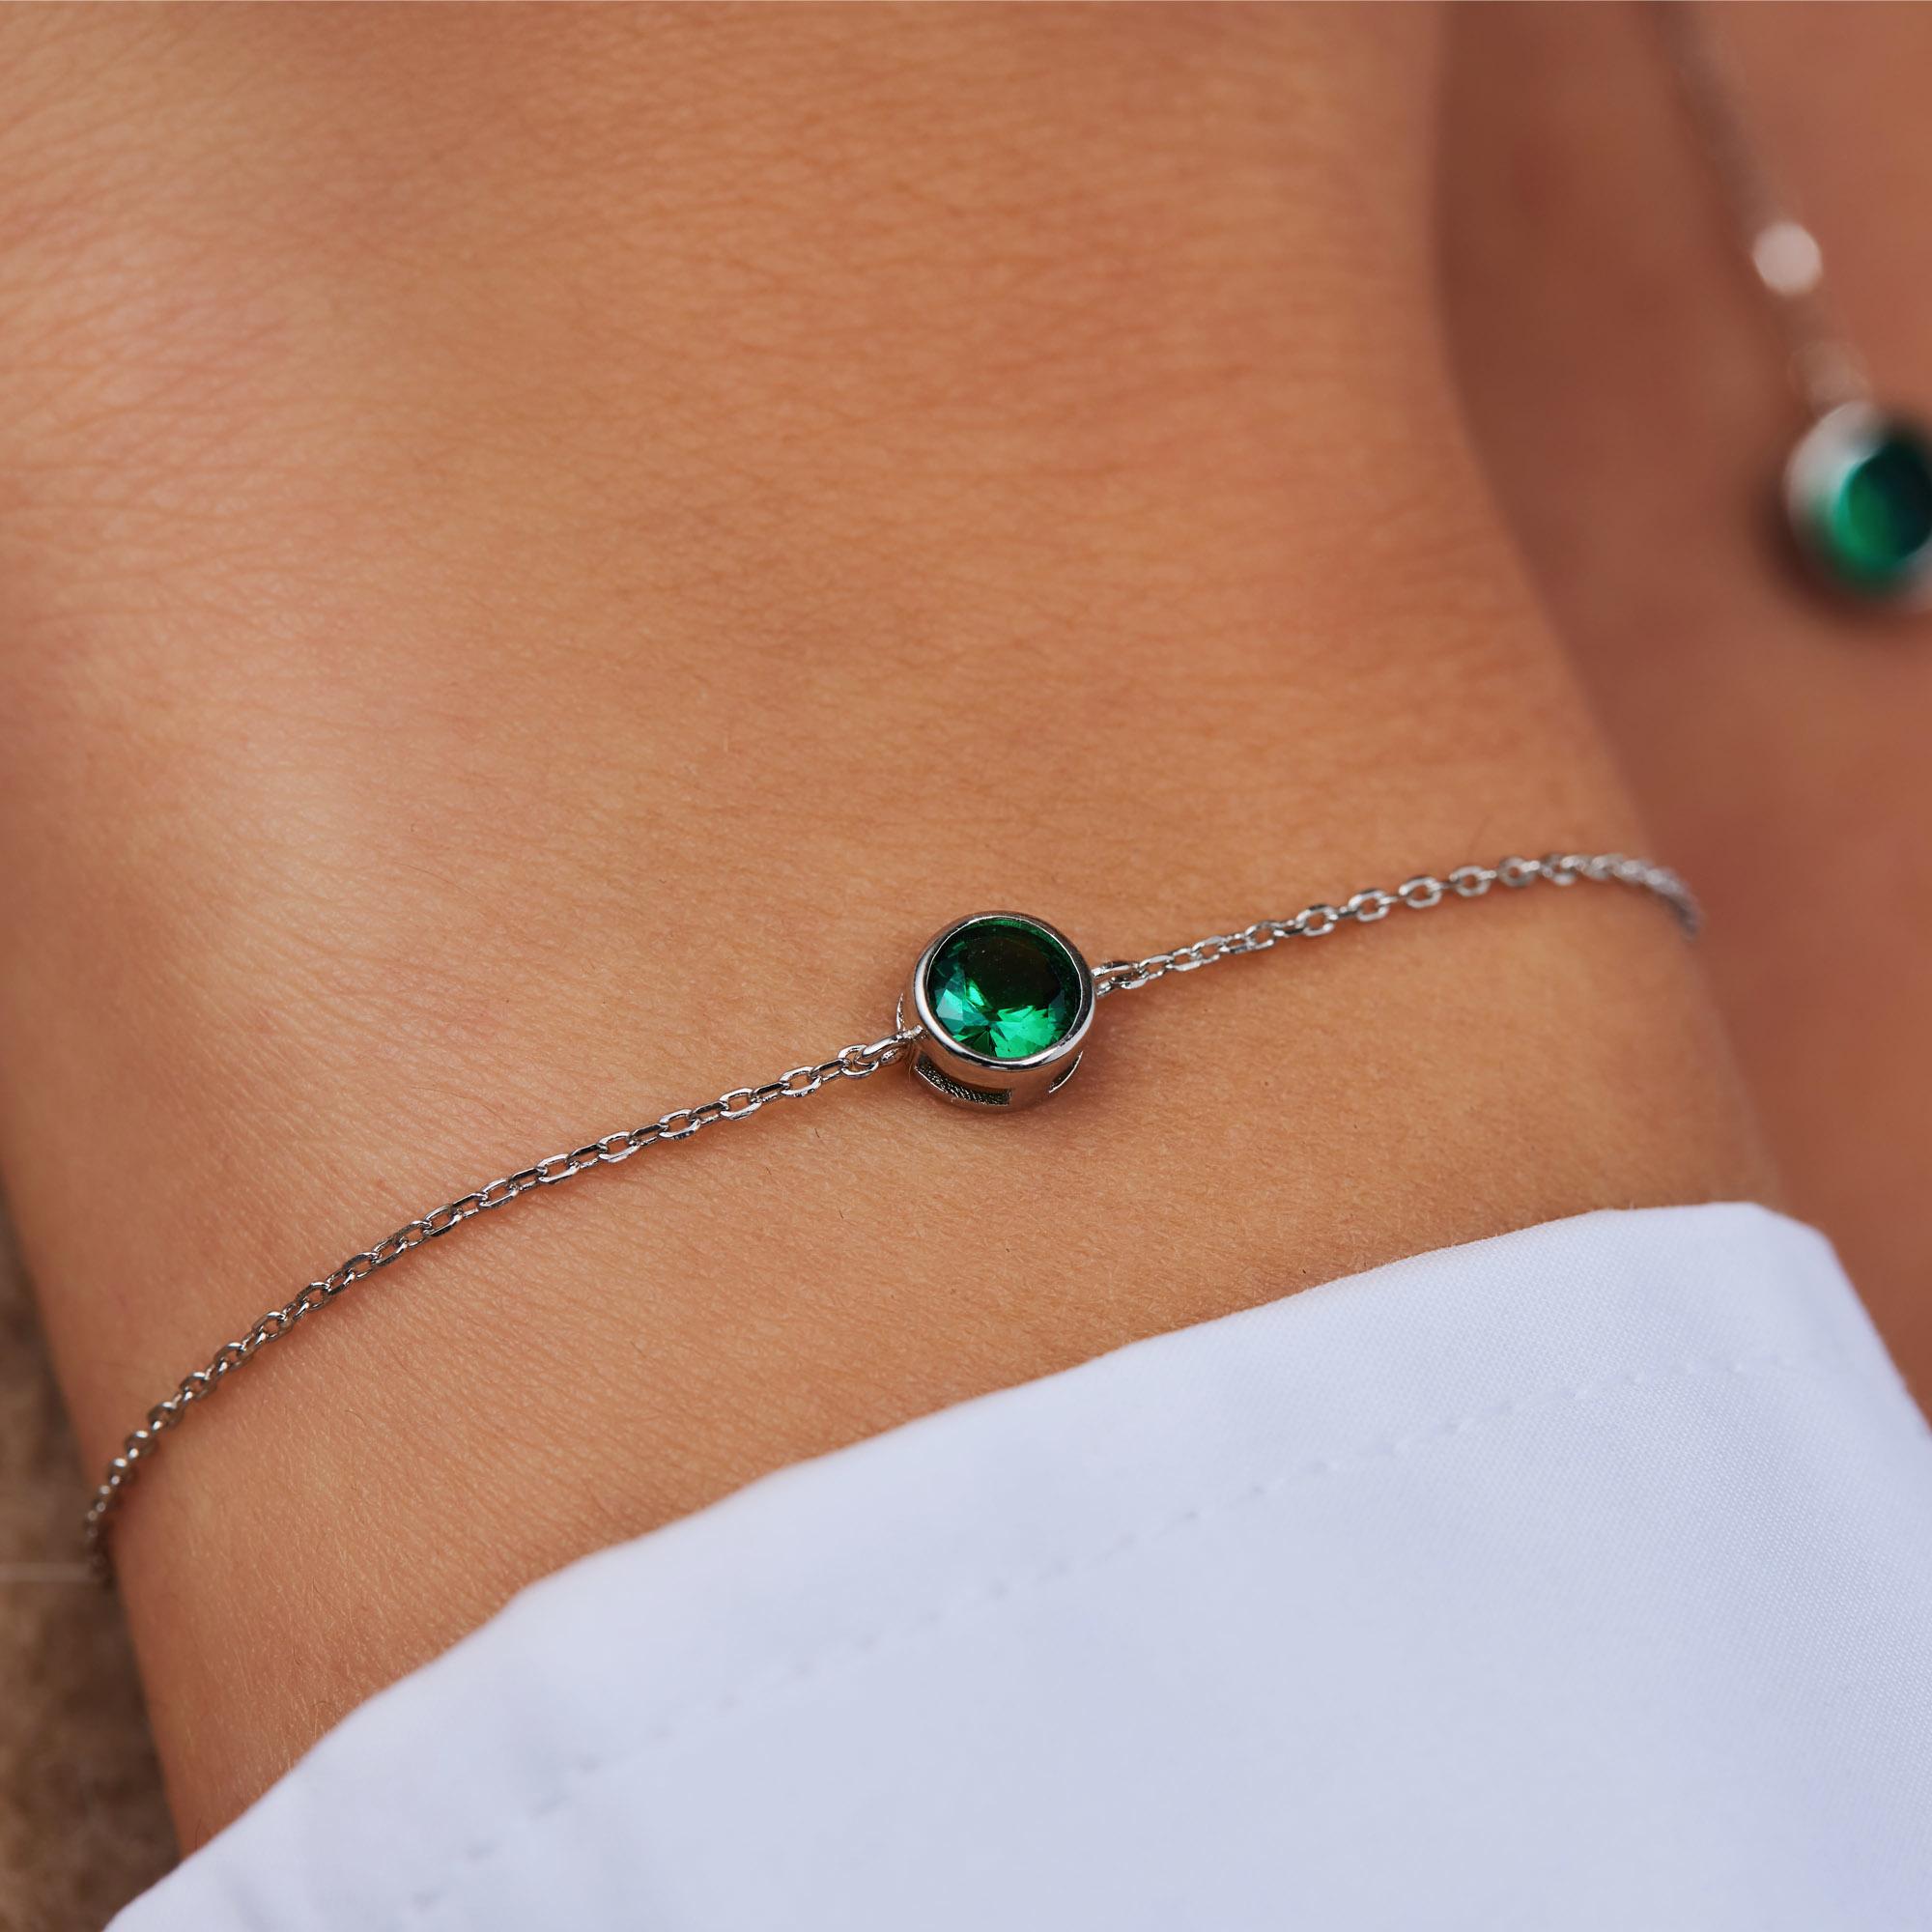 Violet Hamden Venus bracciale in argento sterling 925 con birthstone